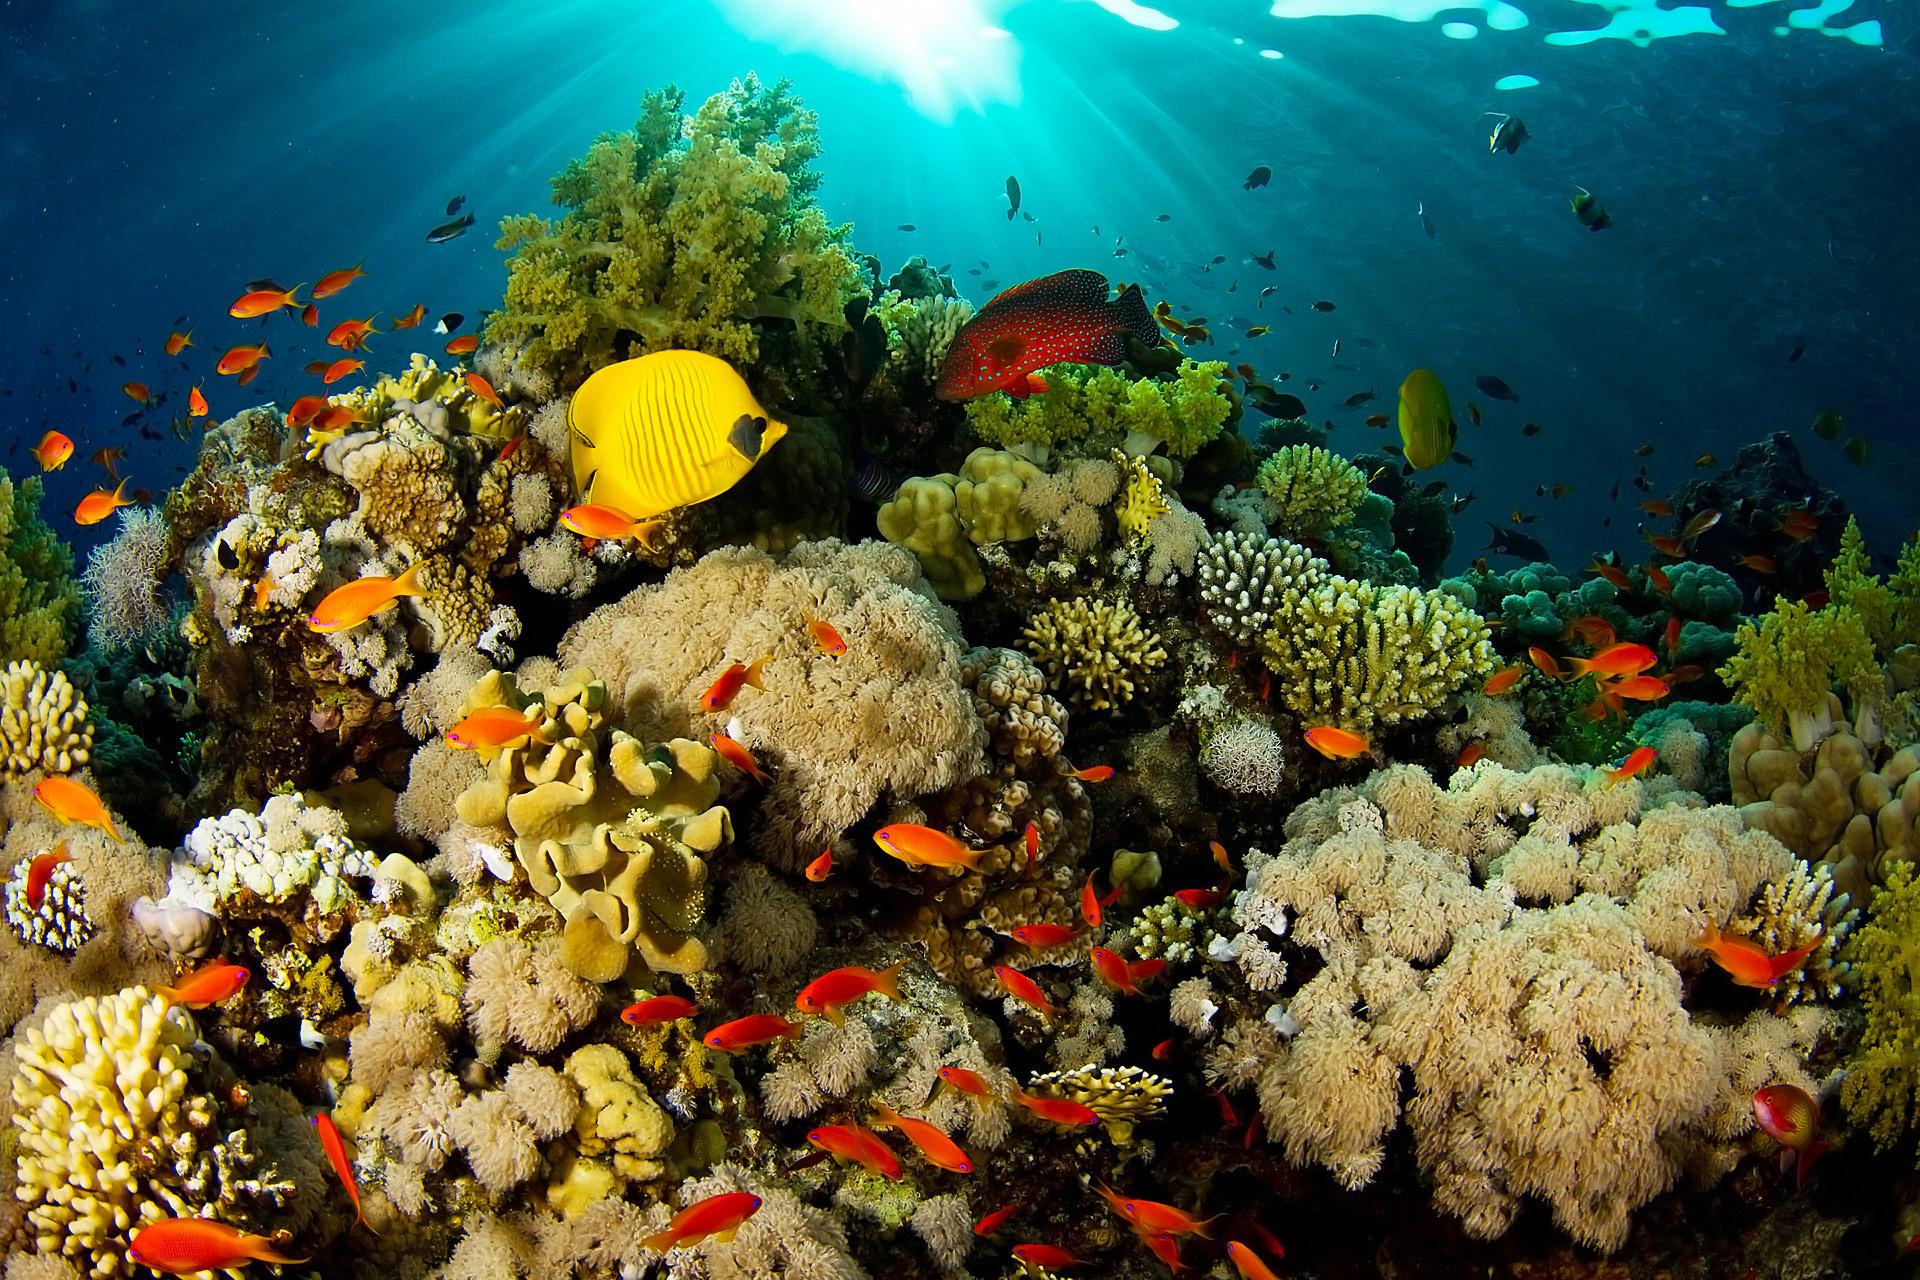 337113_voda_-more_-ryby_-korally_1920x1280_(www.GdeFon.ru)